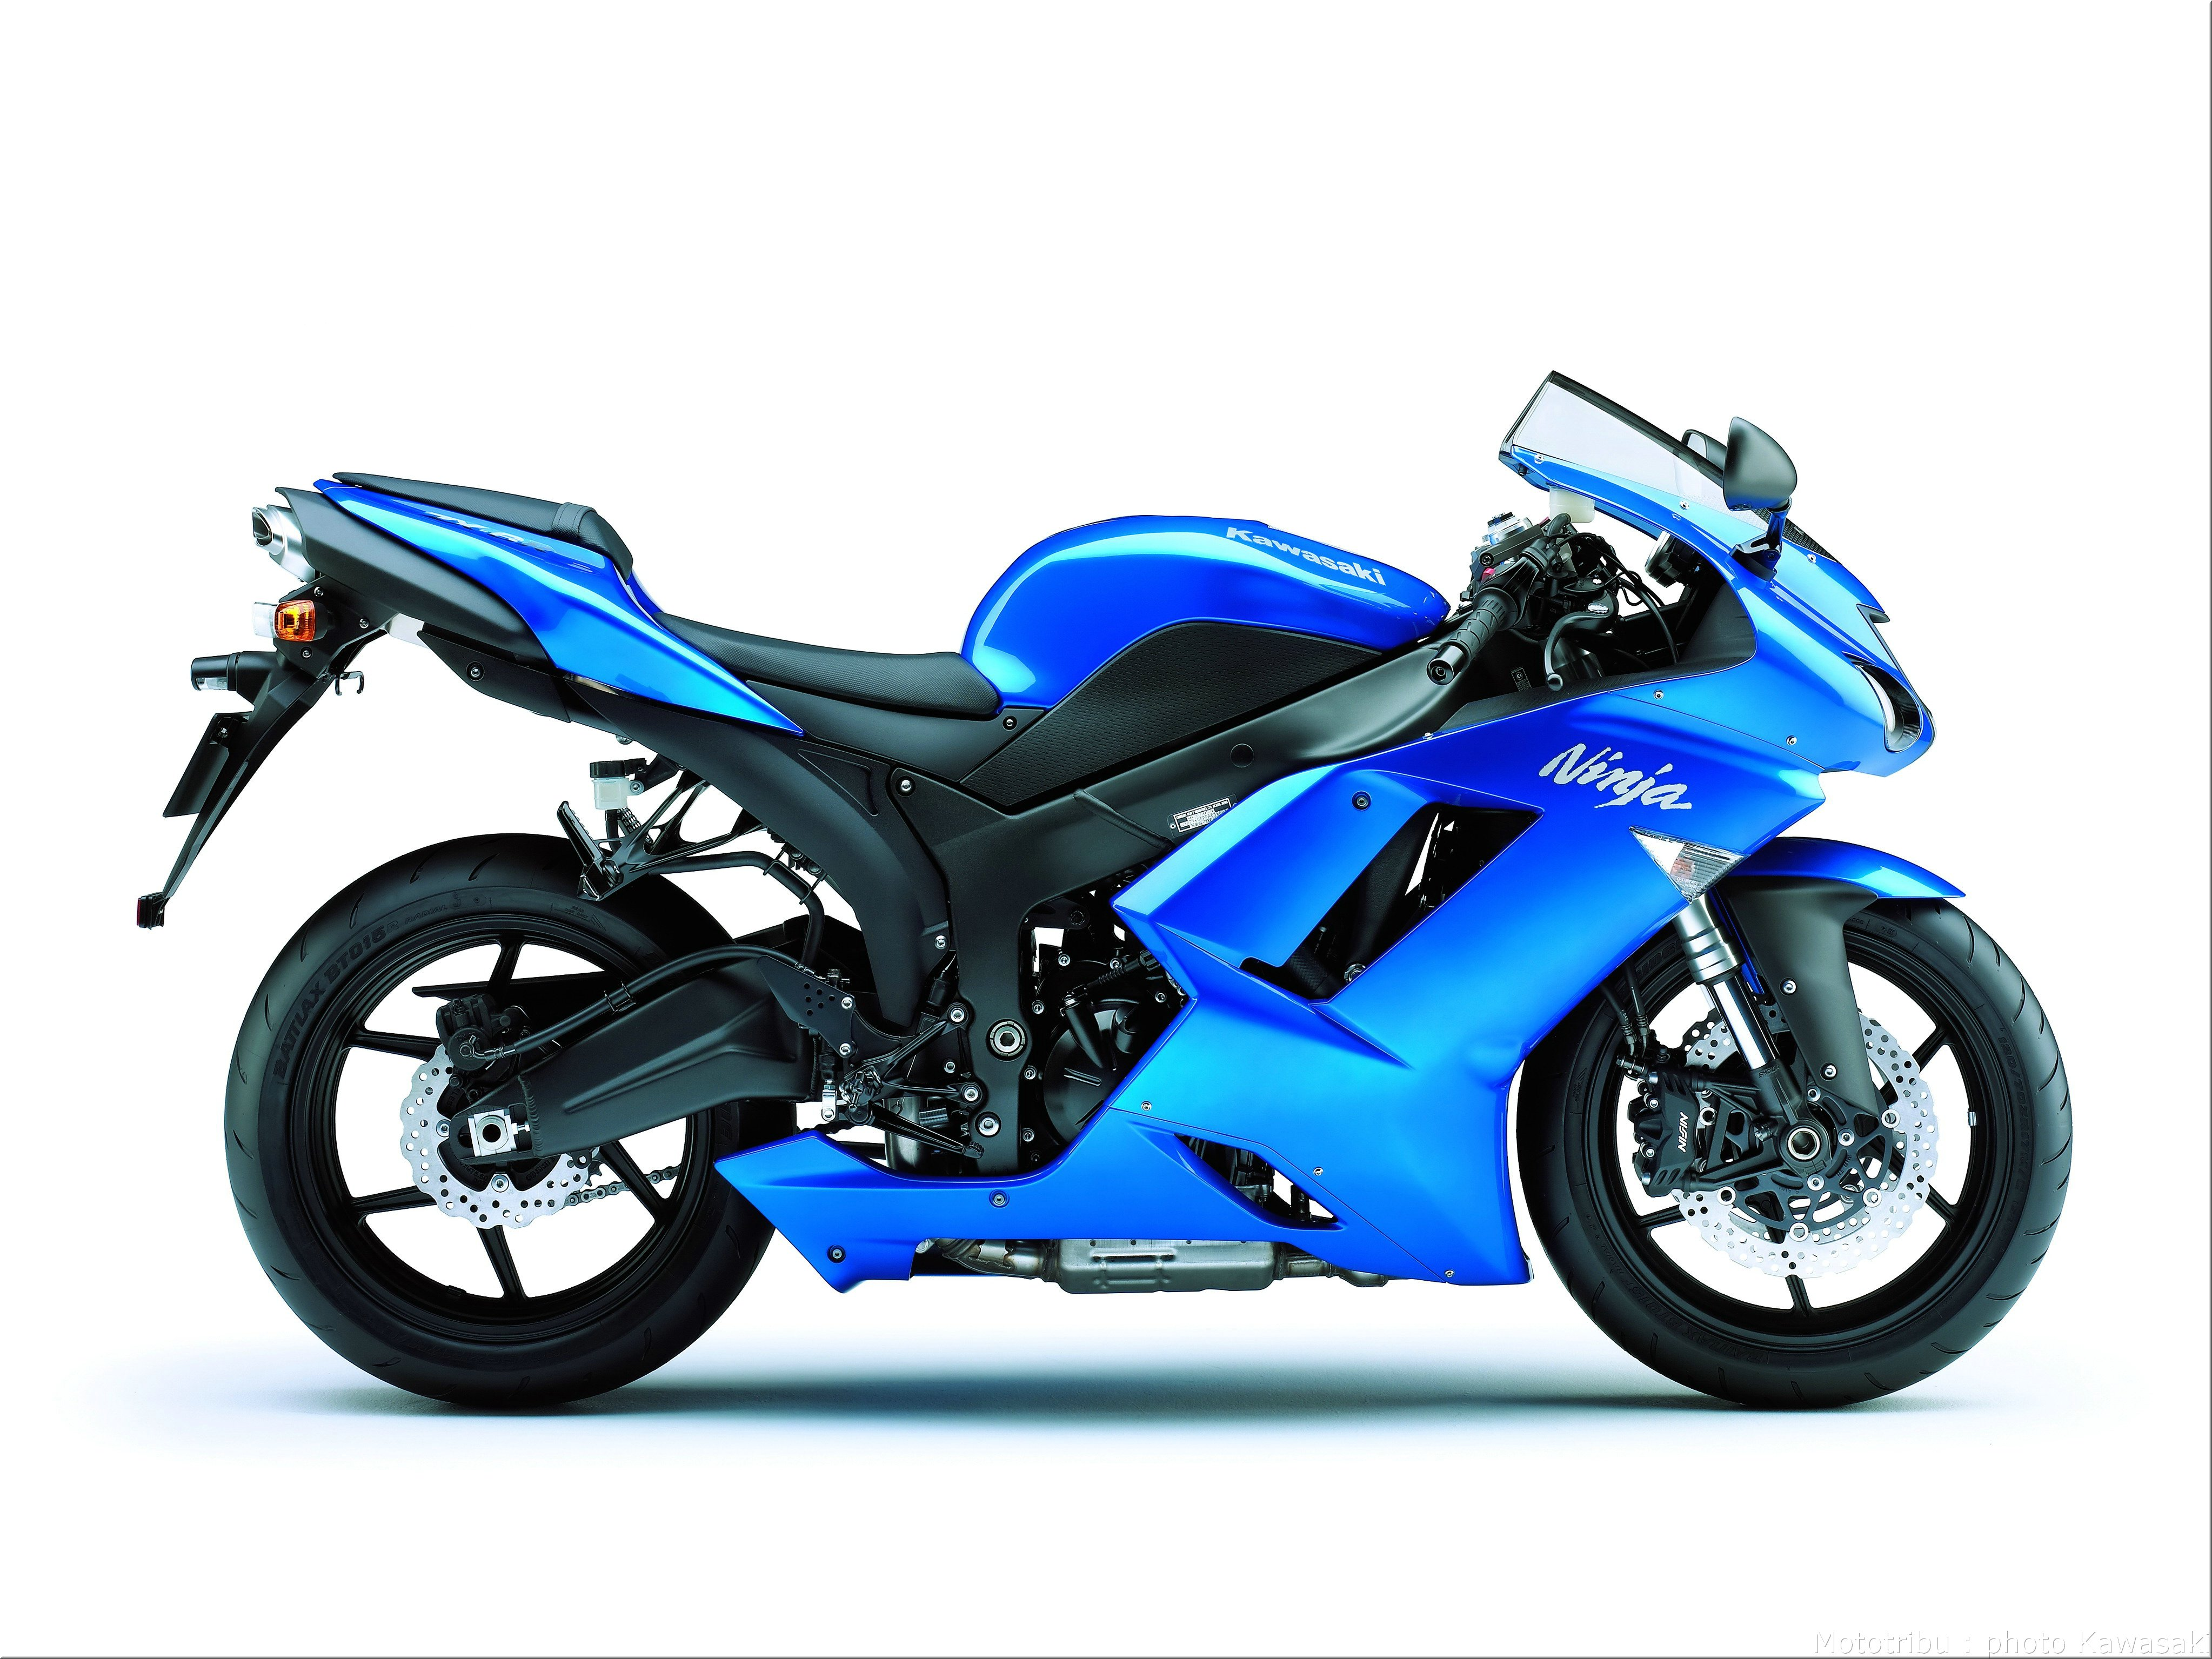 Kawasaki zx6r 2008 Manual